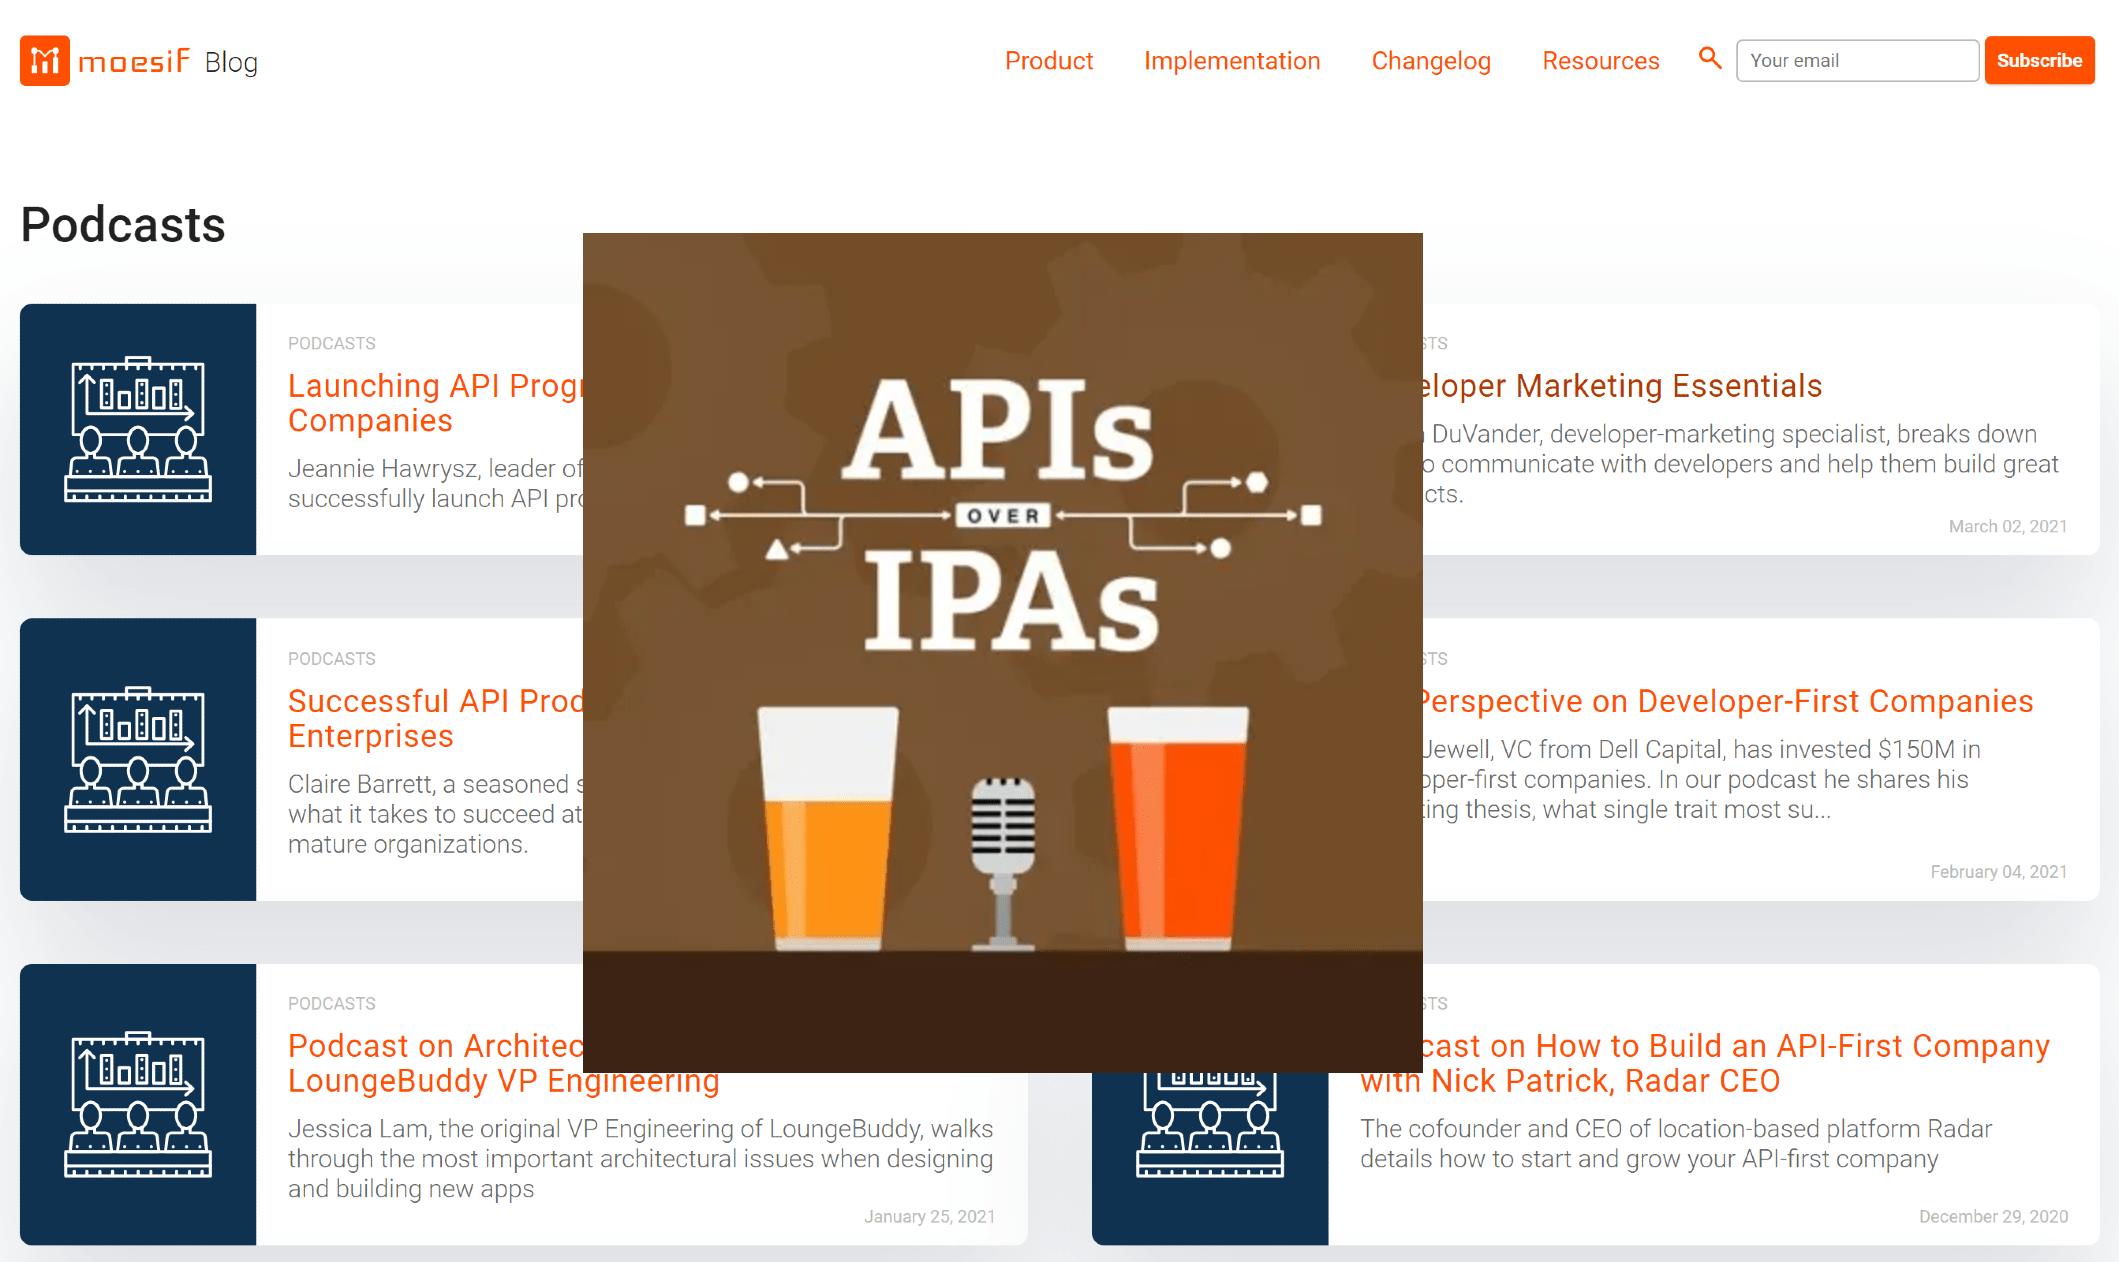 APIs over IPAs